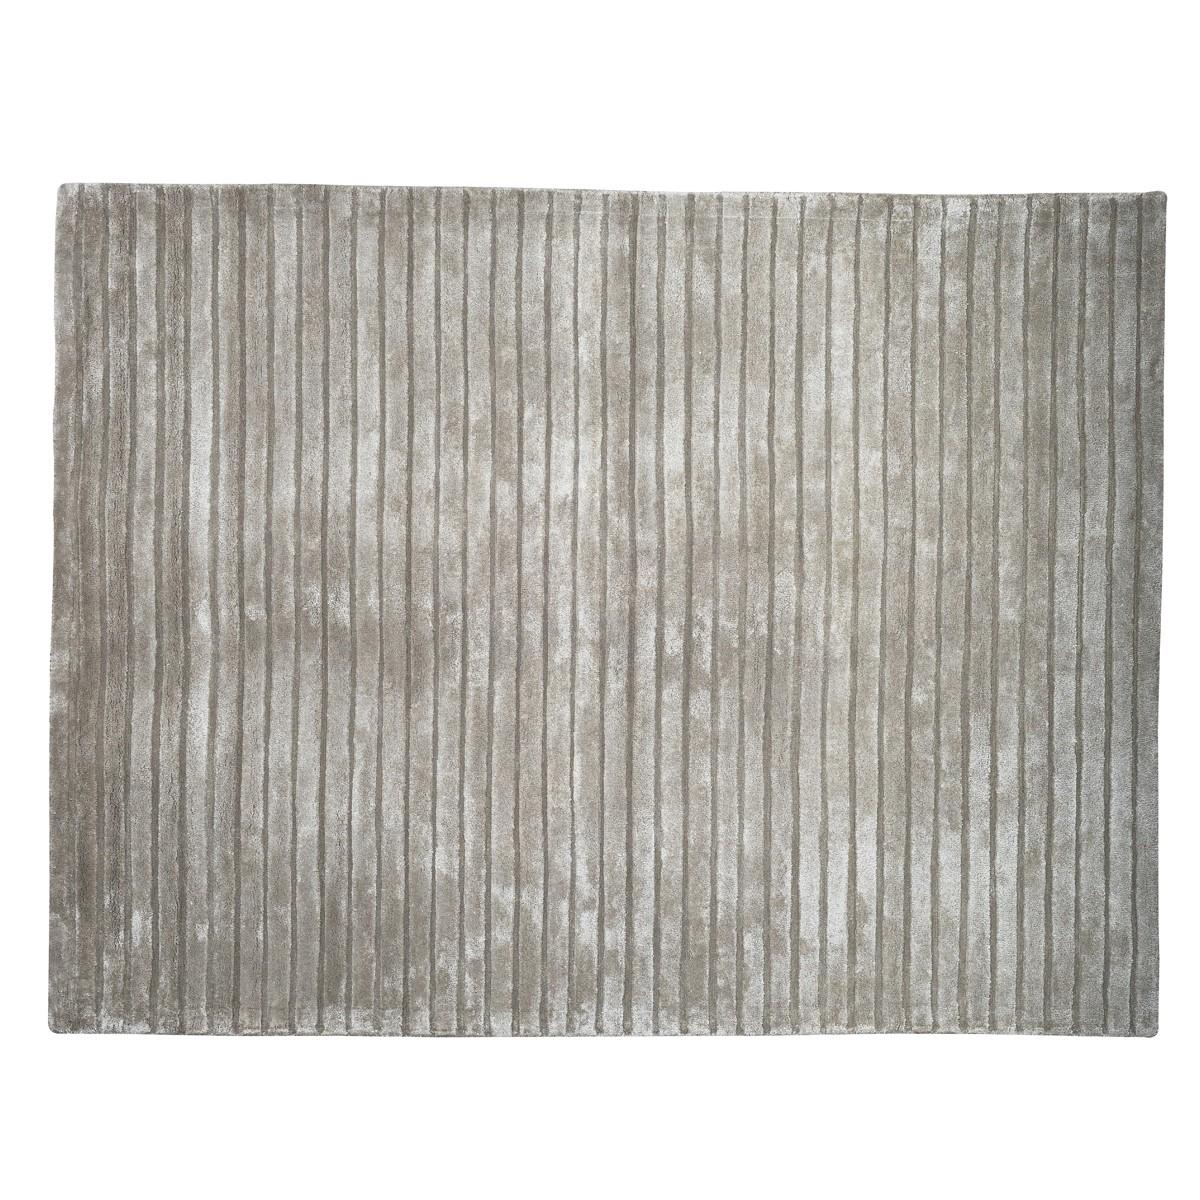 Envy -  Stripe Rug  in Grey